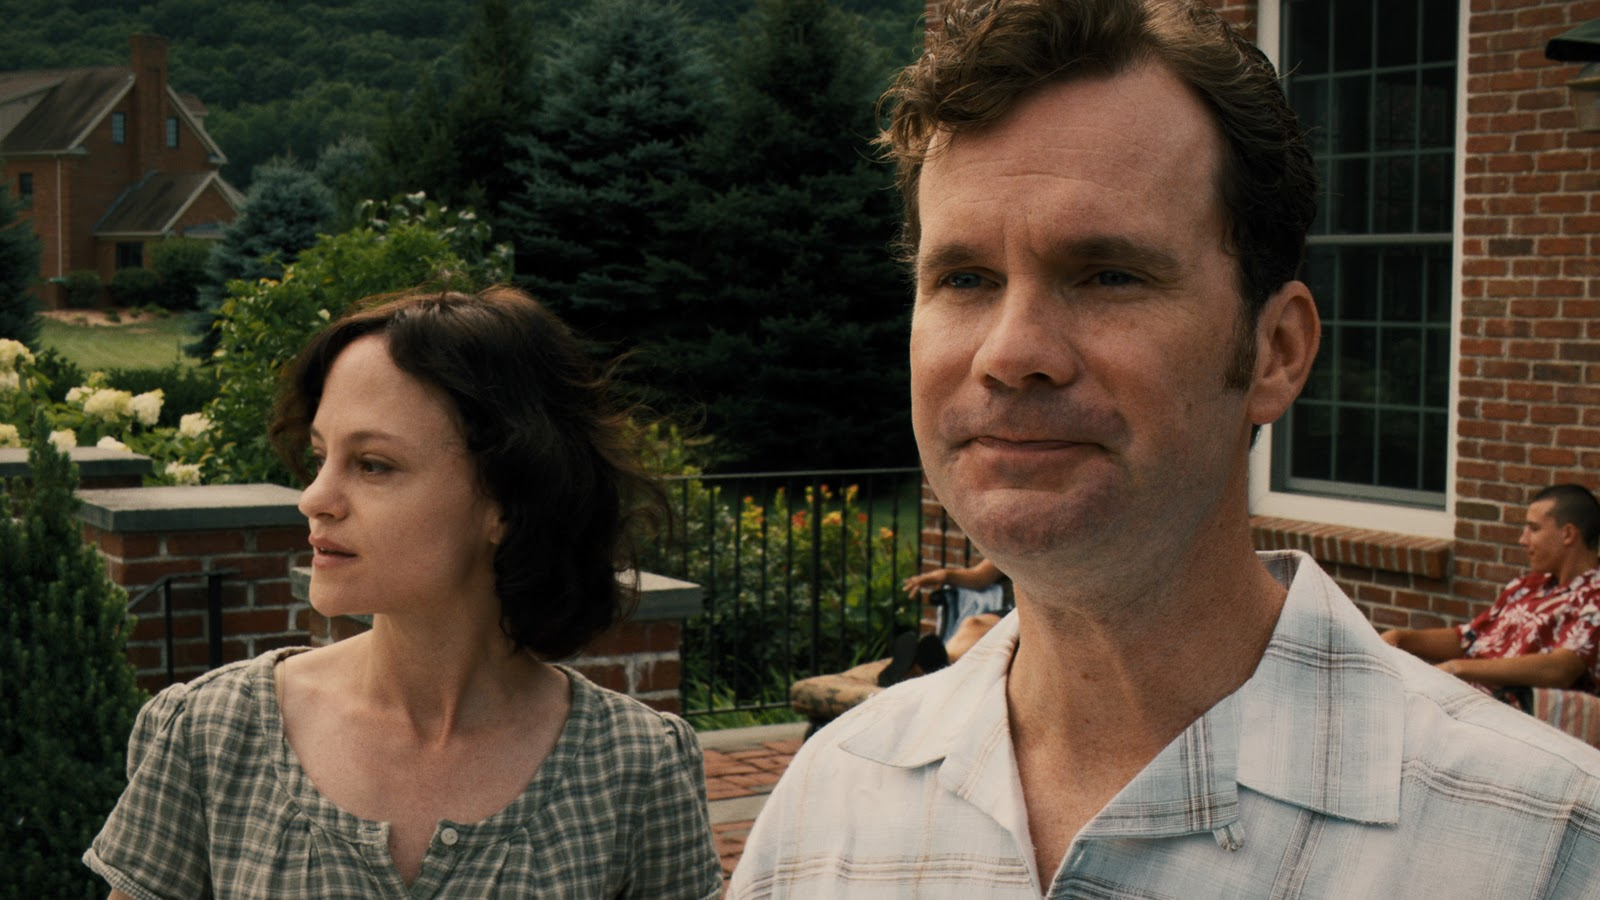 Wife Angela Bettis and husband Sean Bridgers in The Woman (2011)